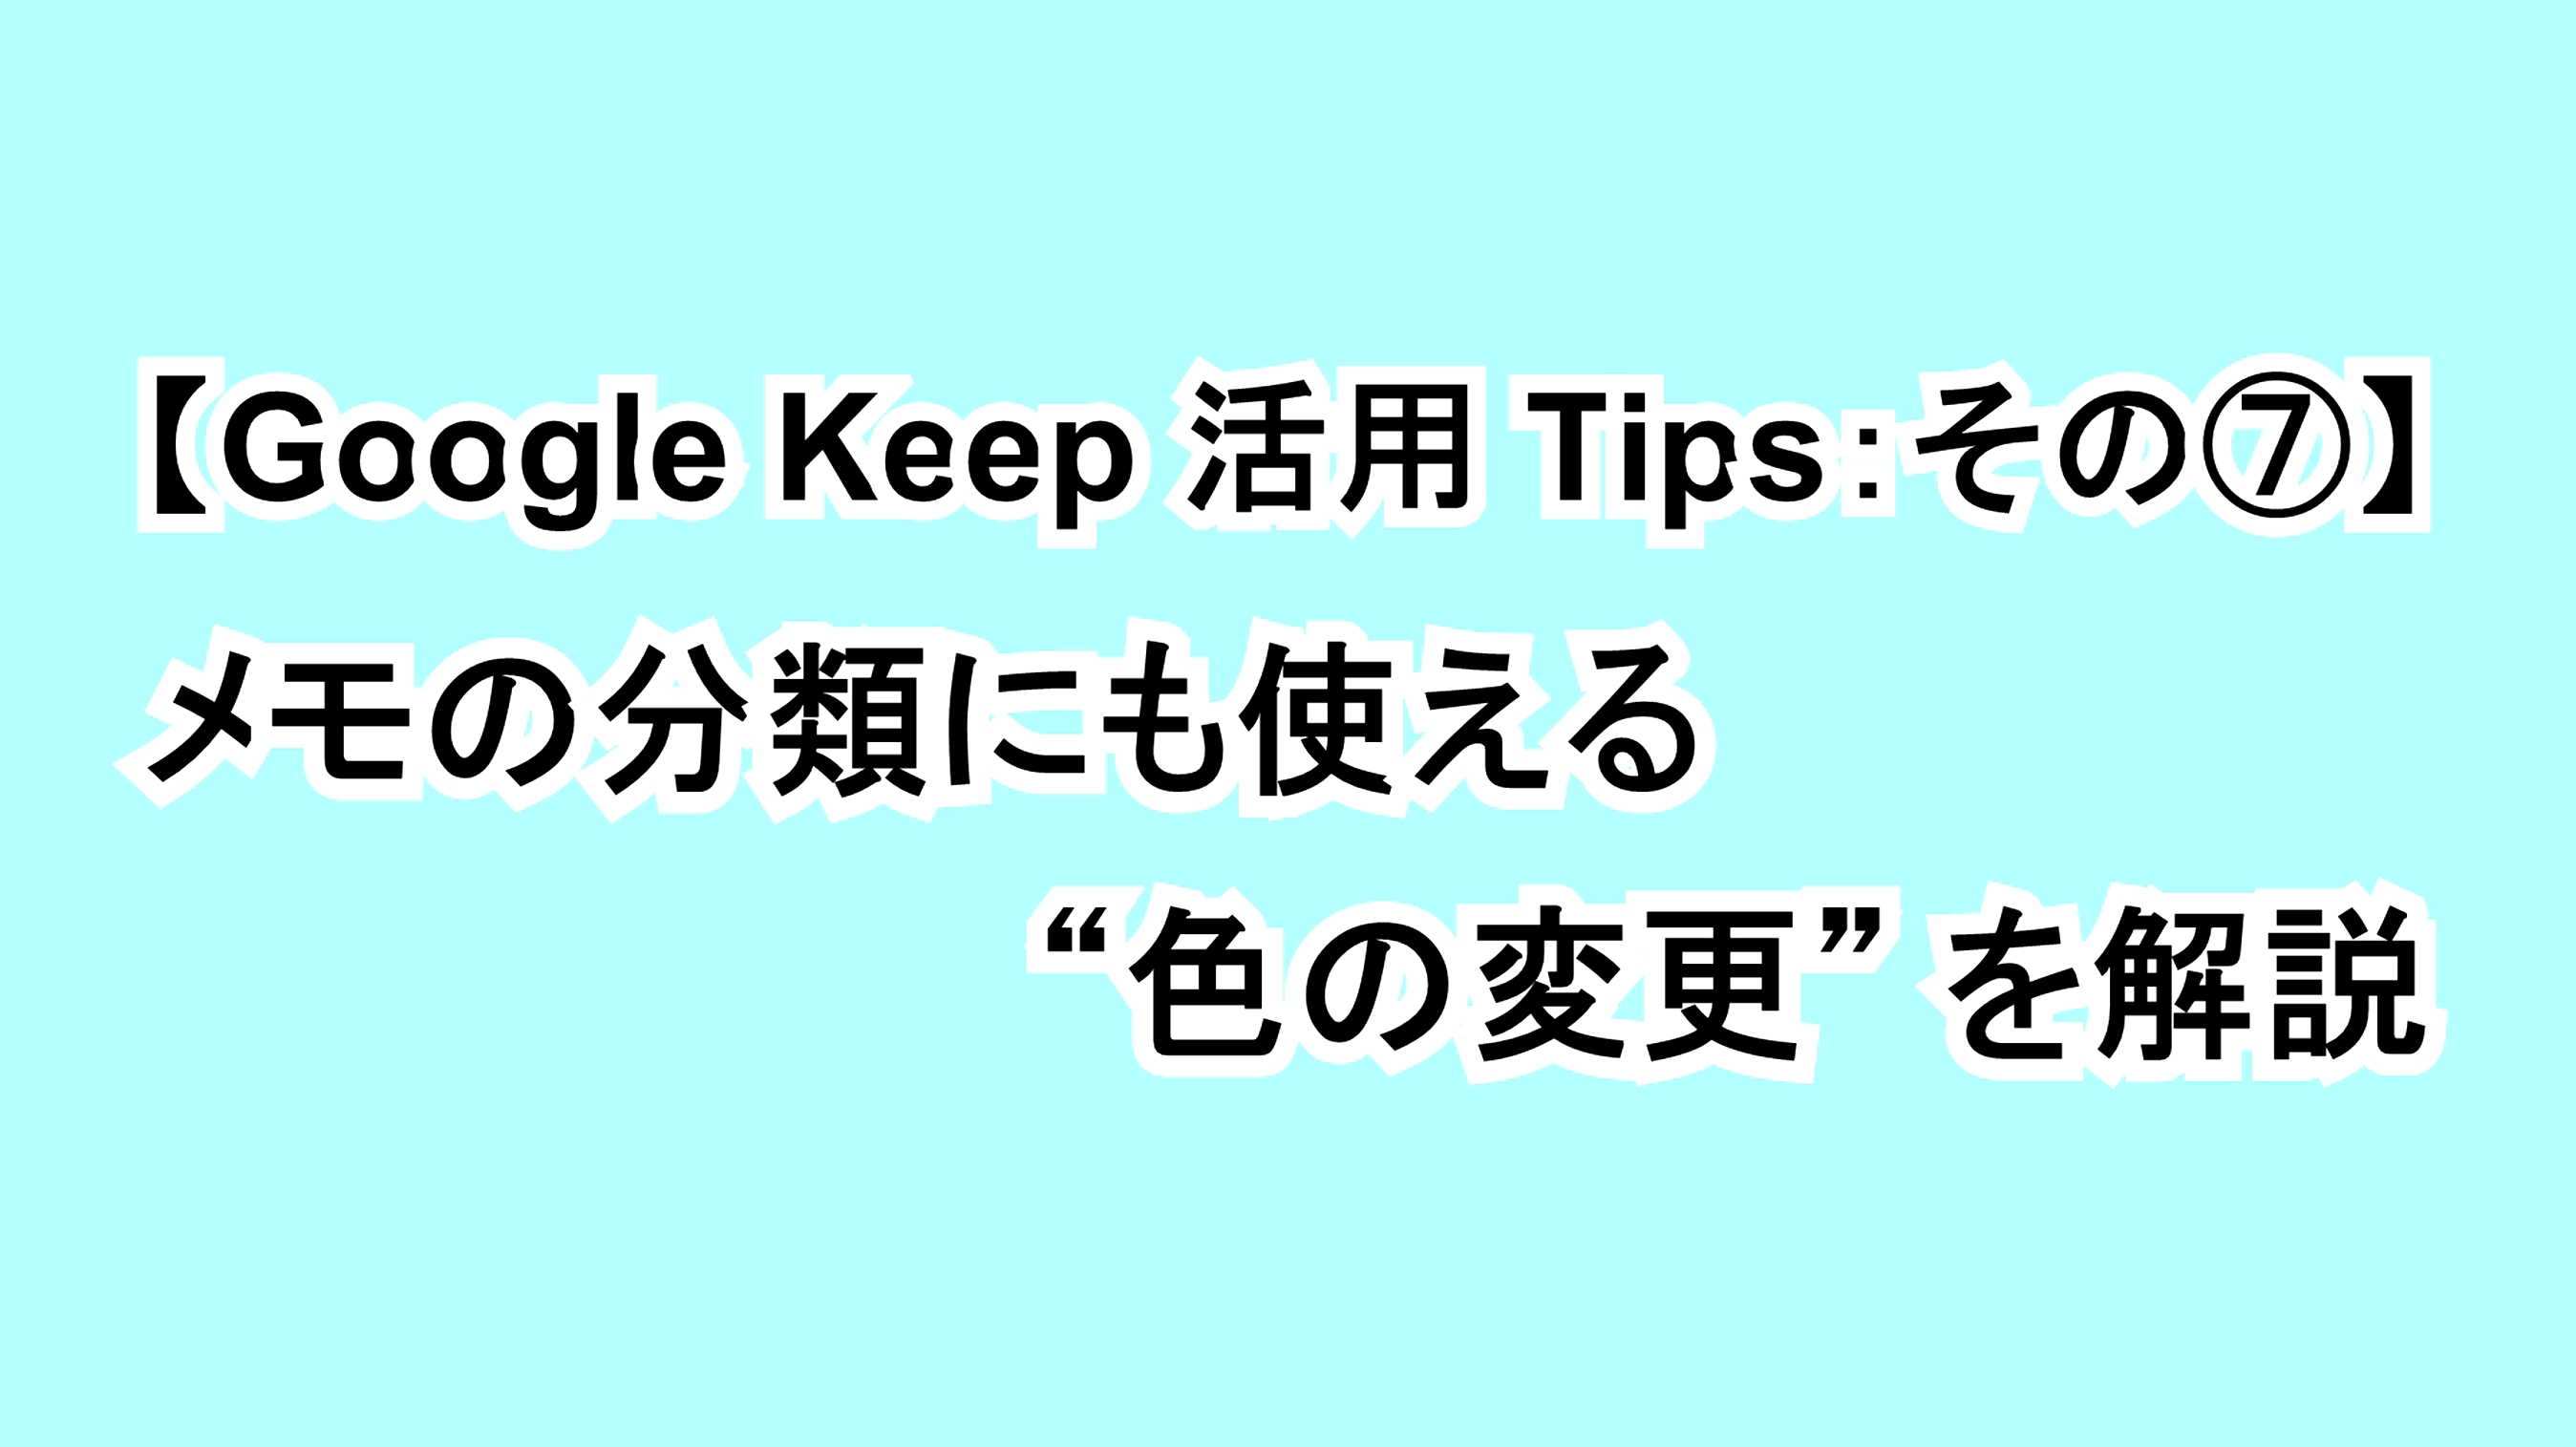 "【Google Keep活用Tips:その⑦】メモの分類にも使える""色の変更""を解説"